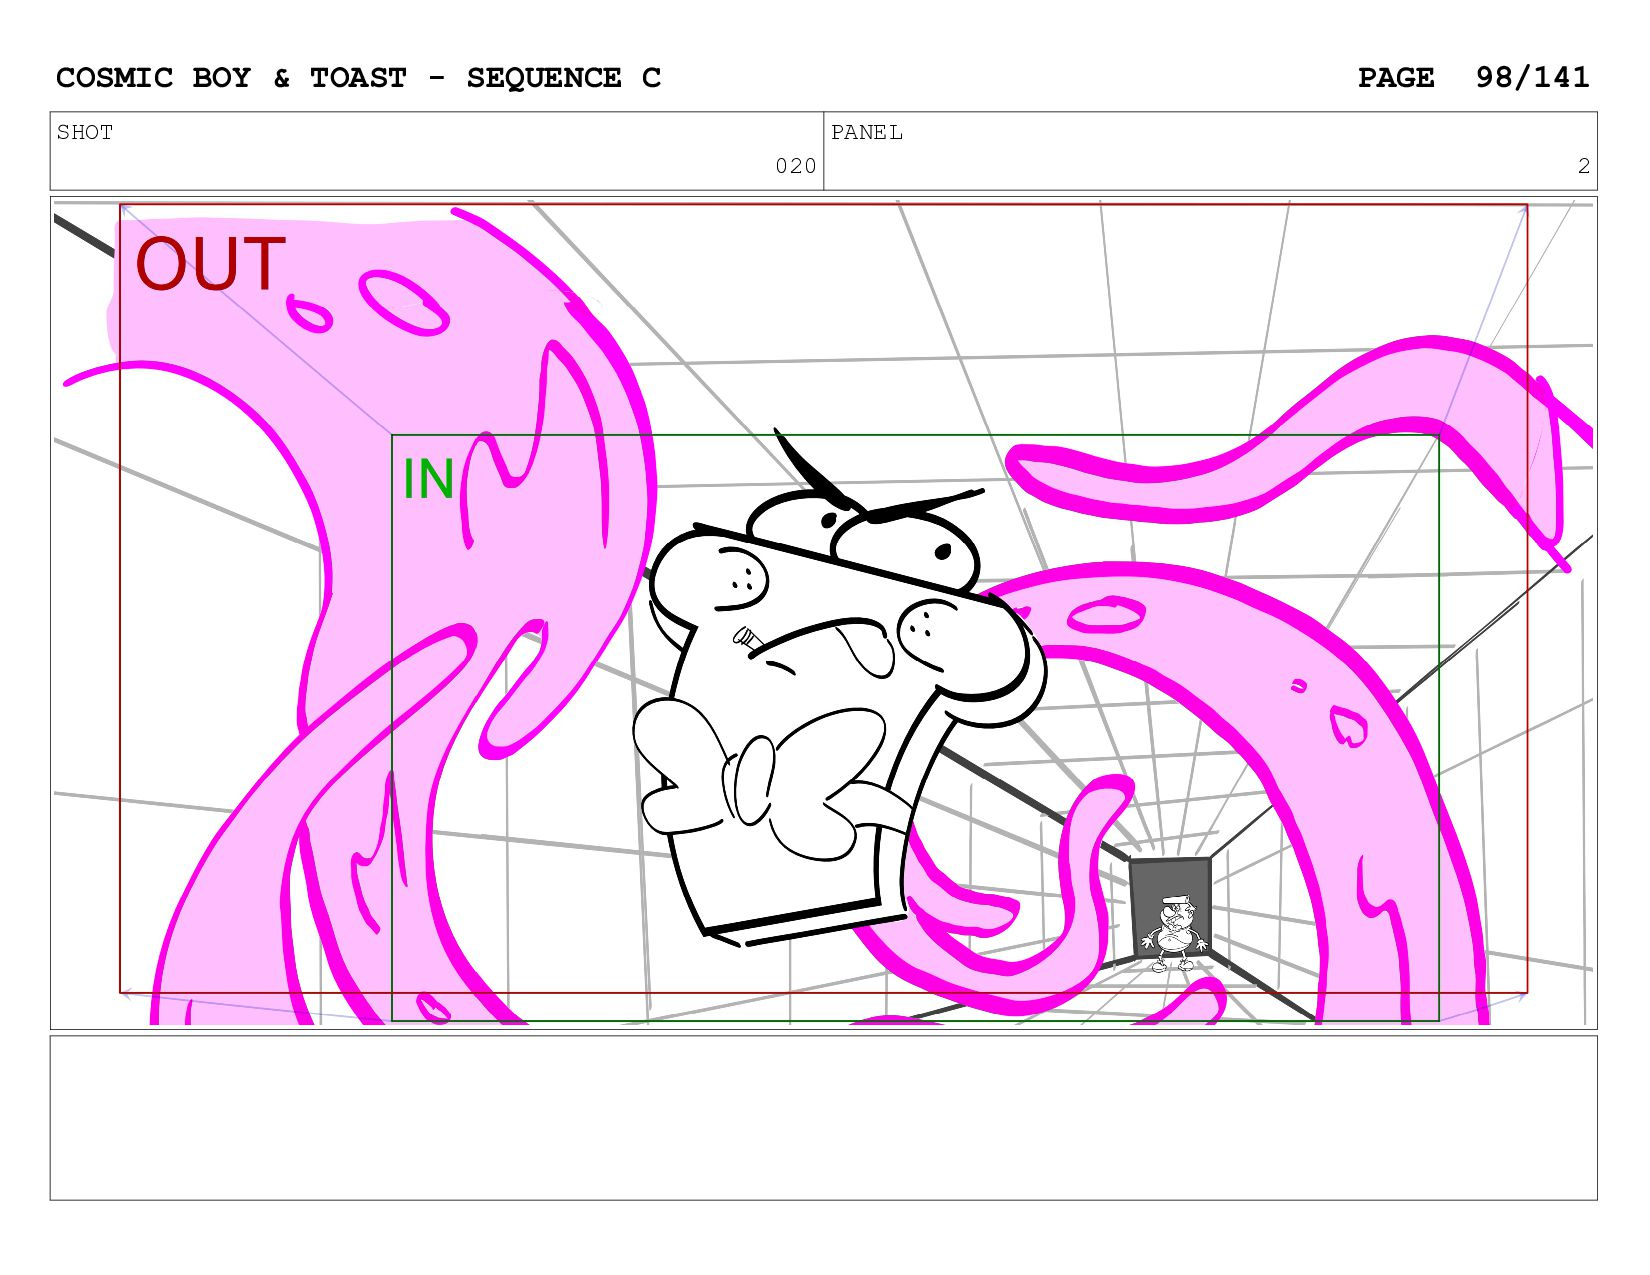 SCENE 020 PANEL B COSMIC BOY & TOAST - SEQUENCE...